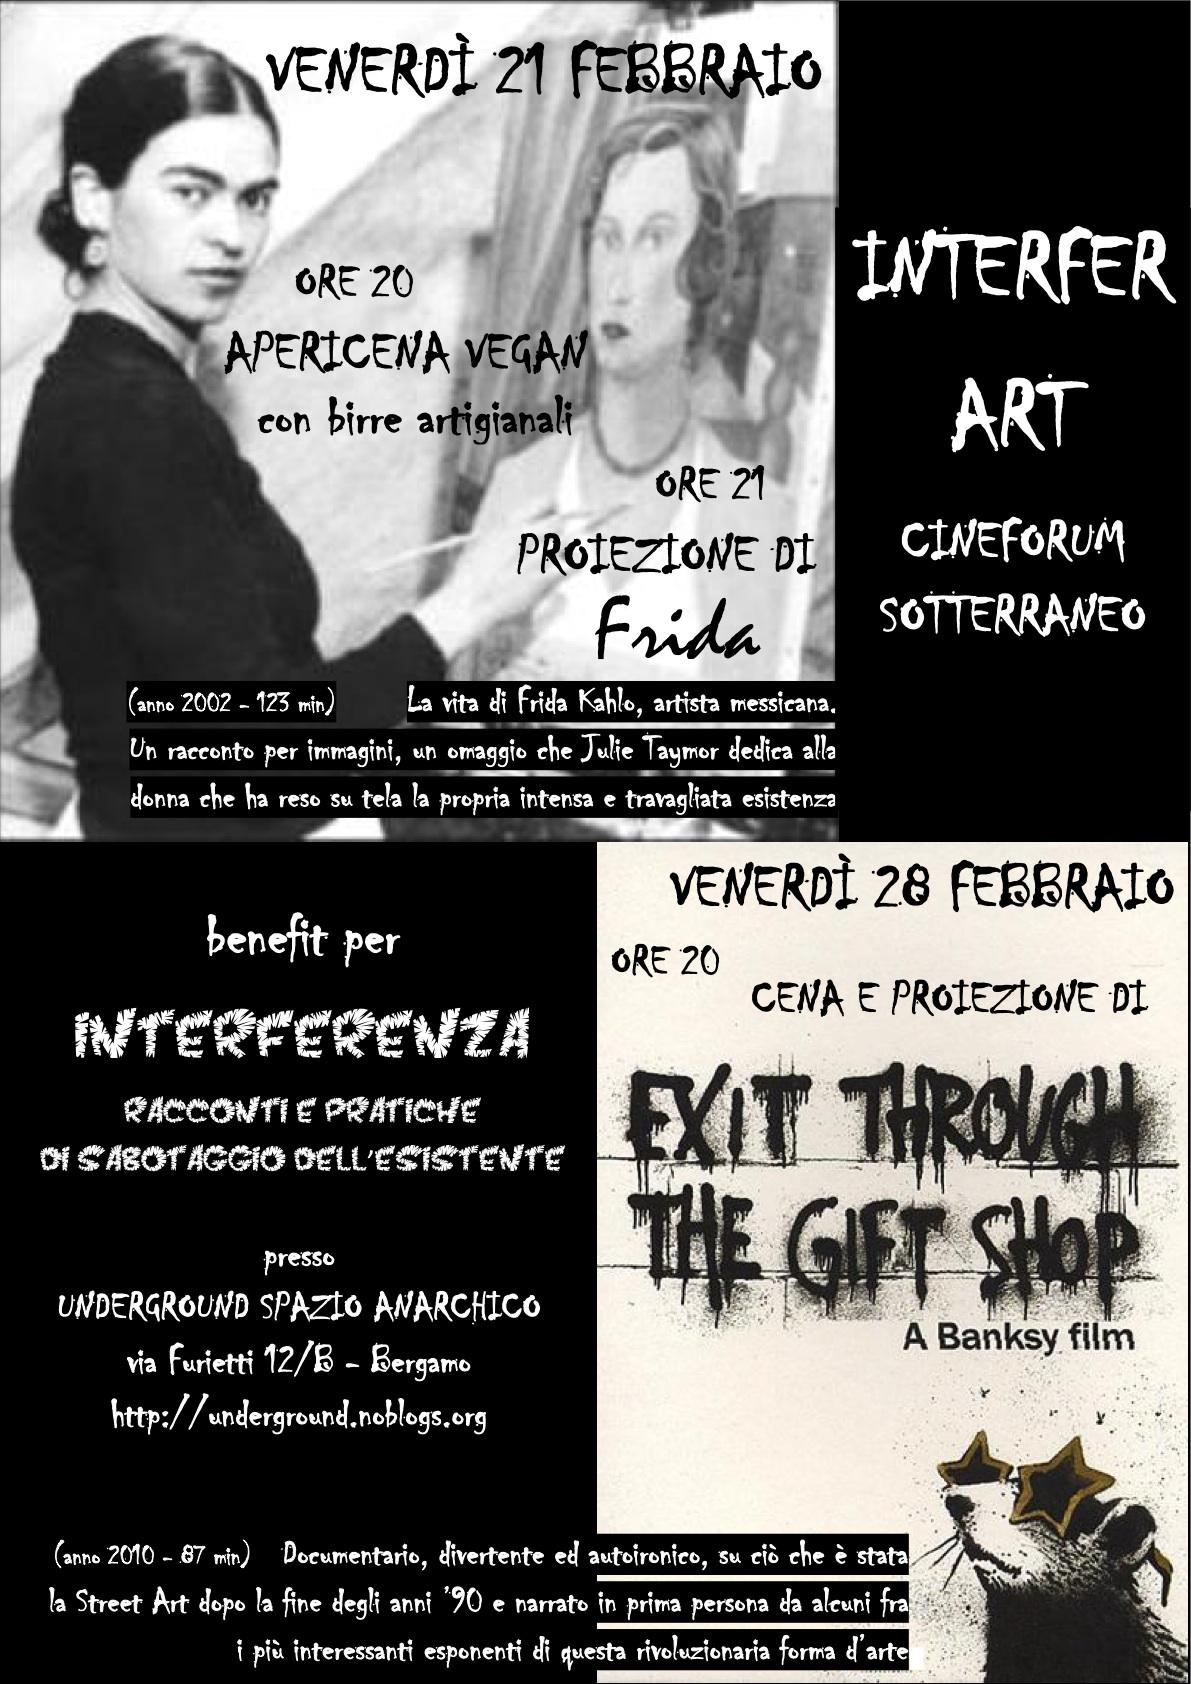 2014_02_21-28_interf